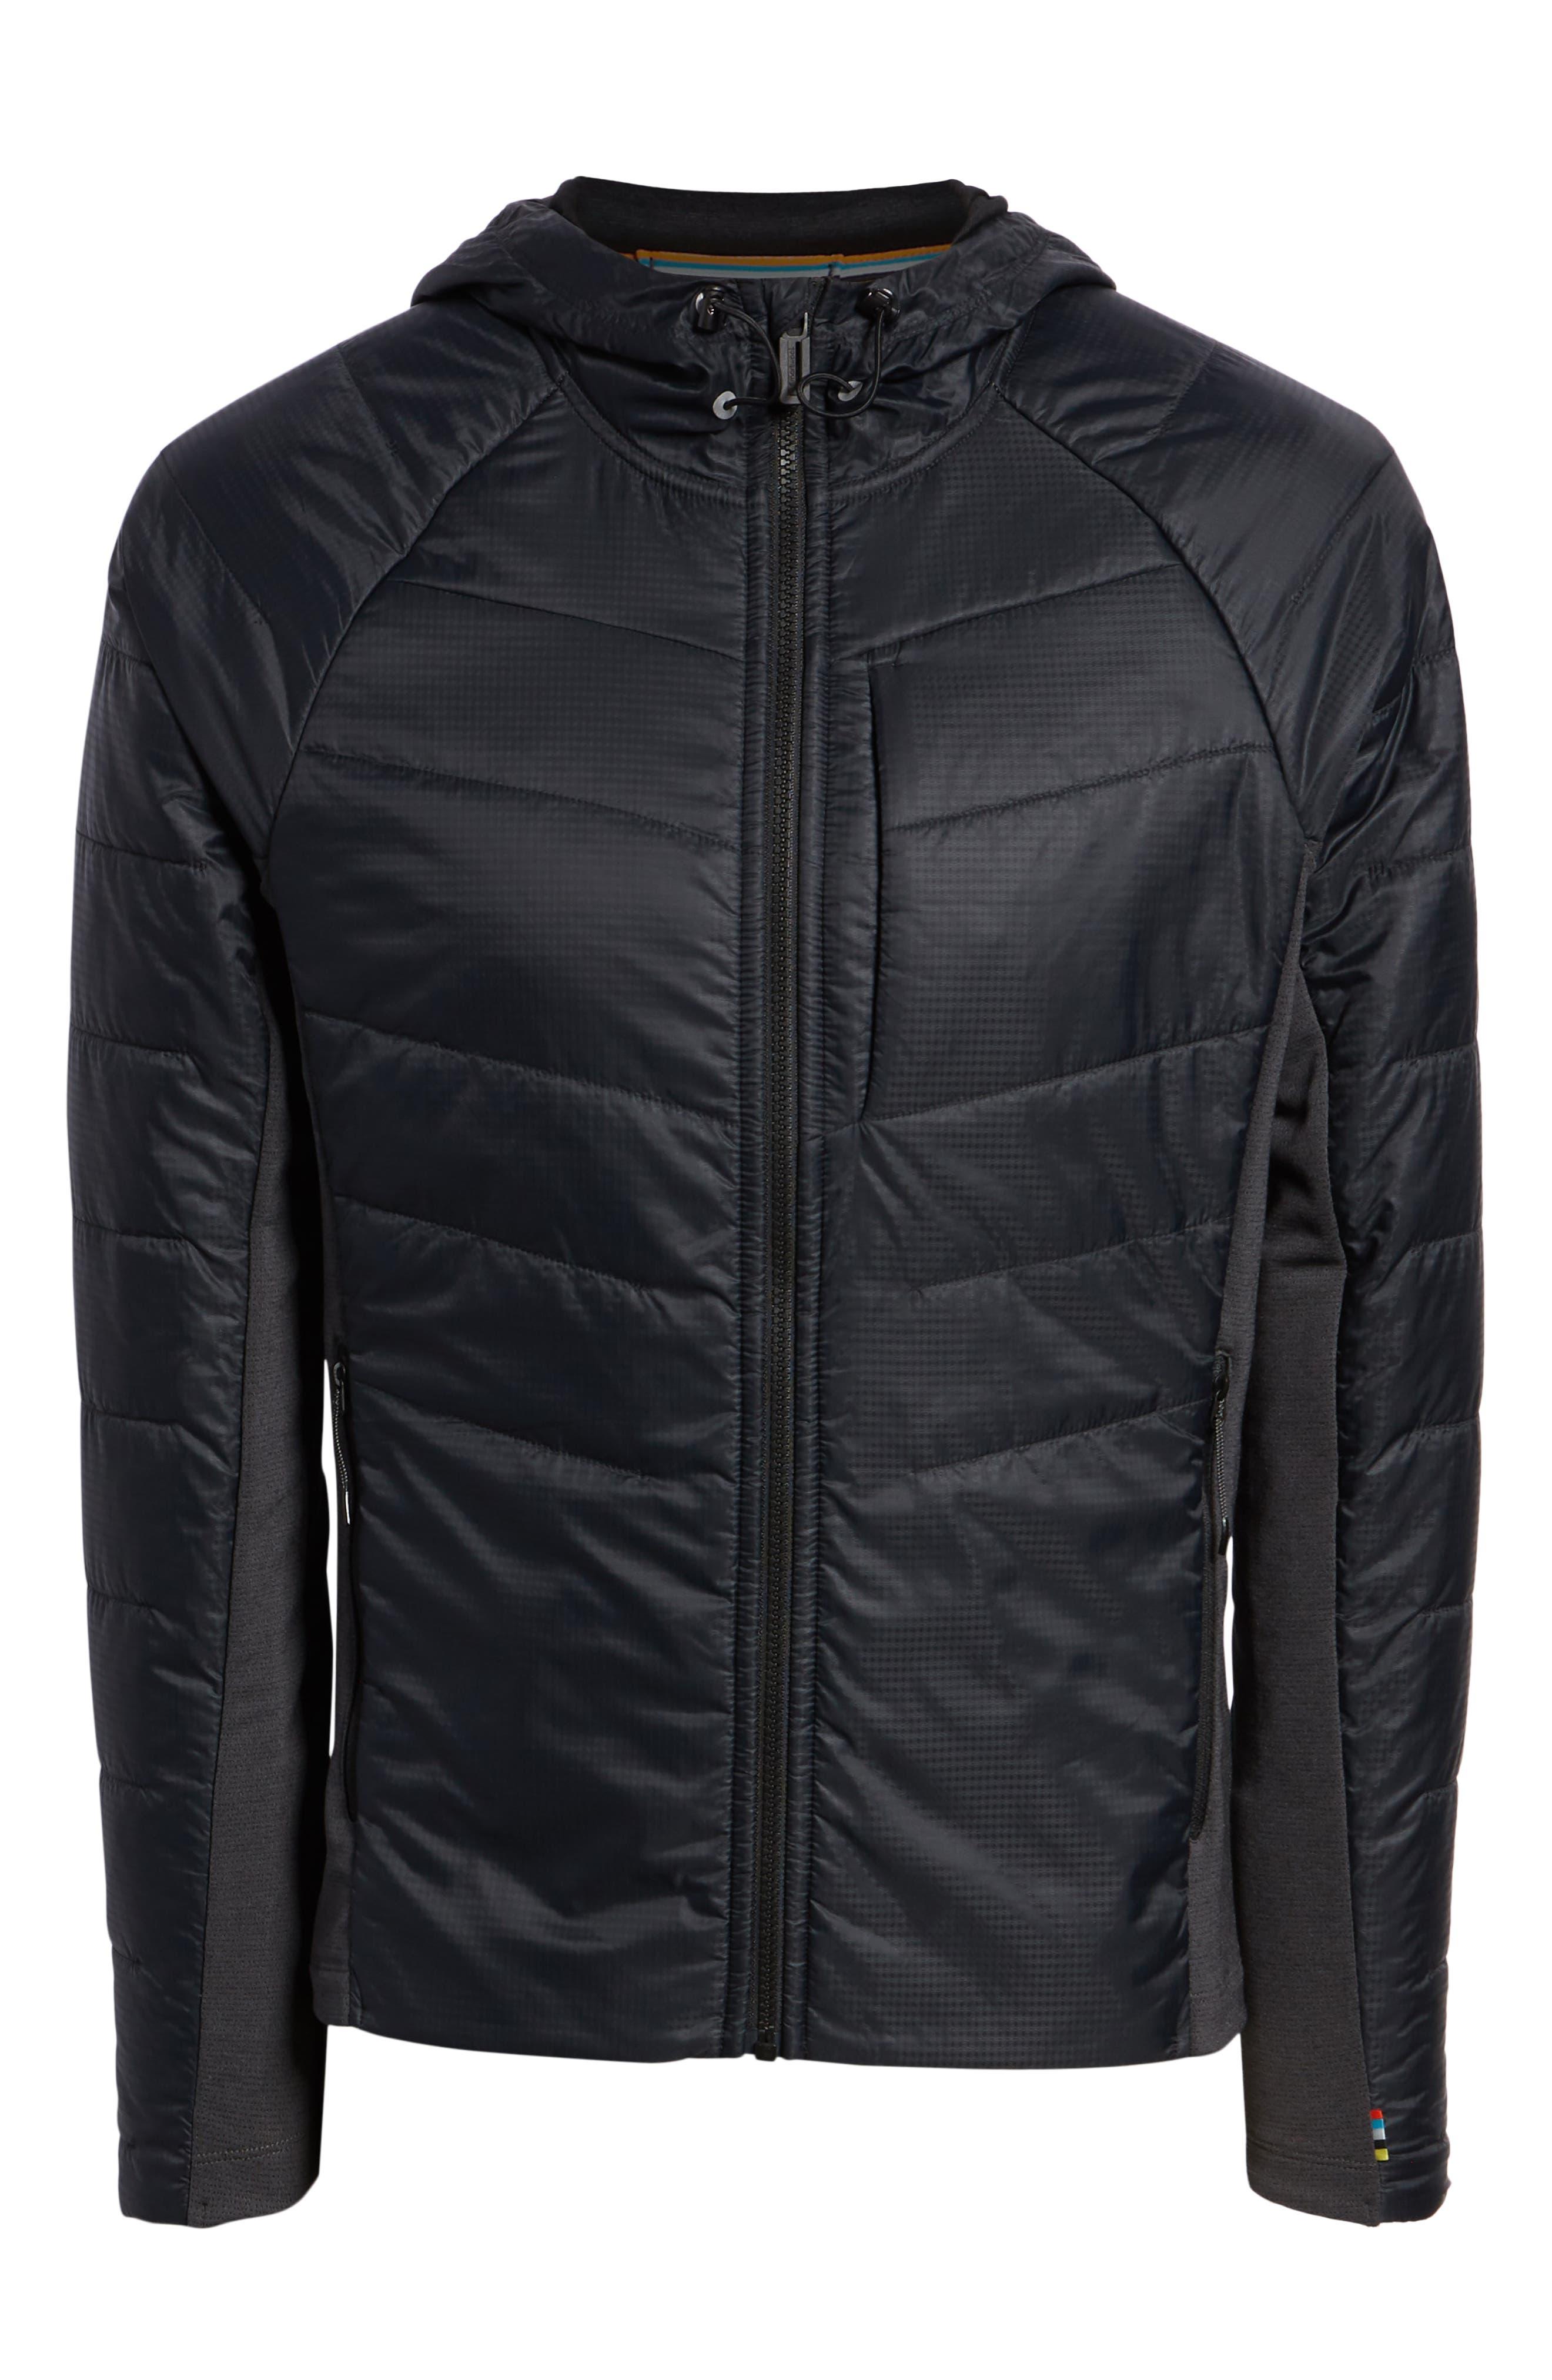 Smartloft 60 Hooded Jacket,                             Alternate thumbnail 5, color,                             BLACK